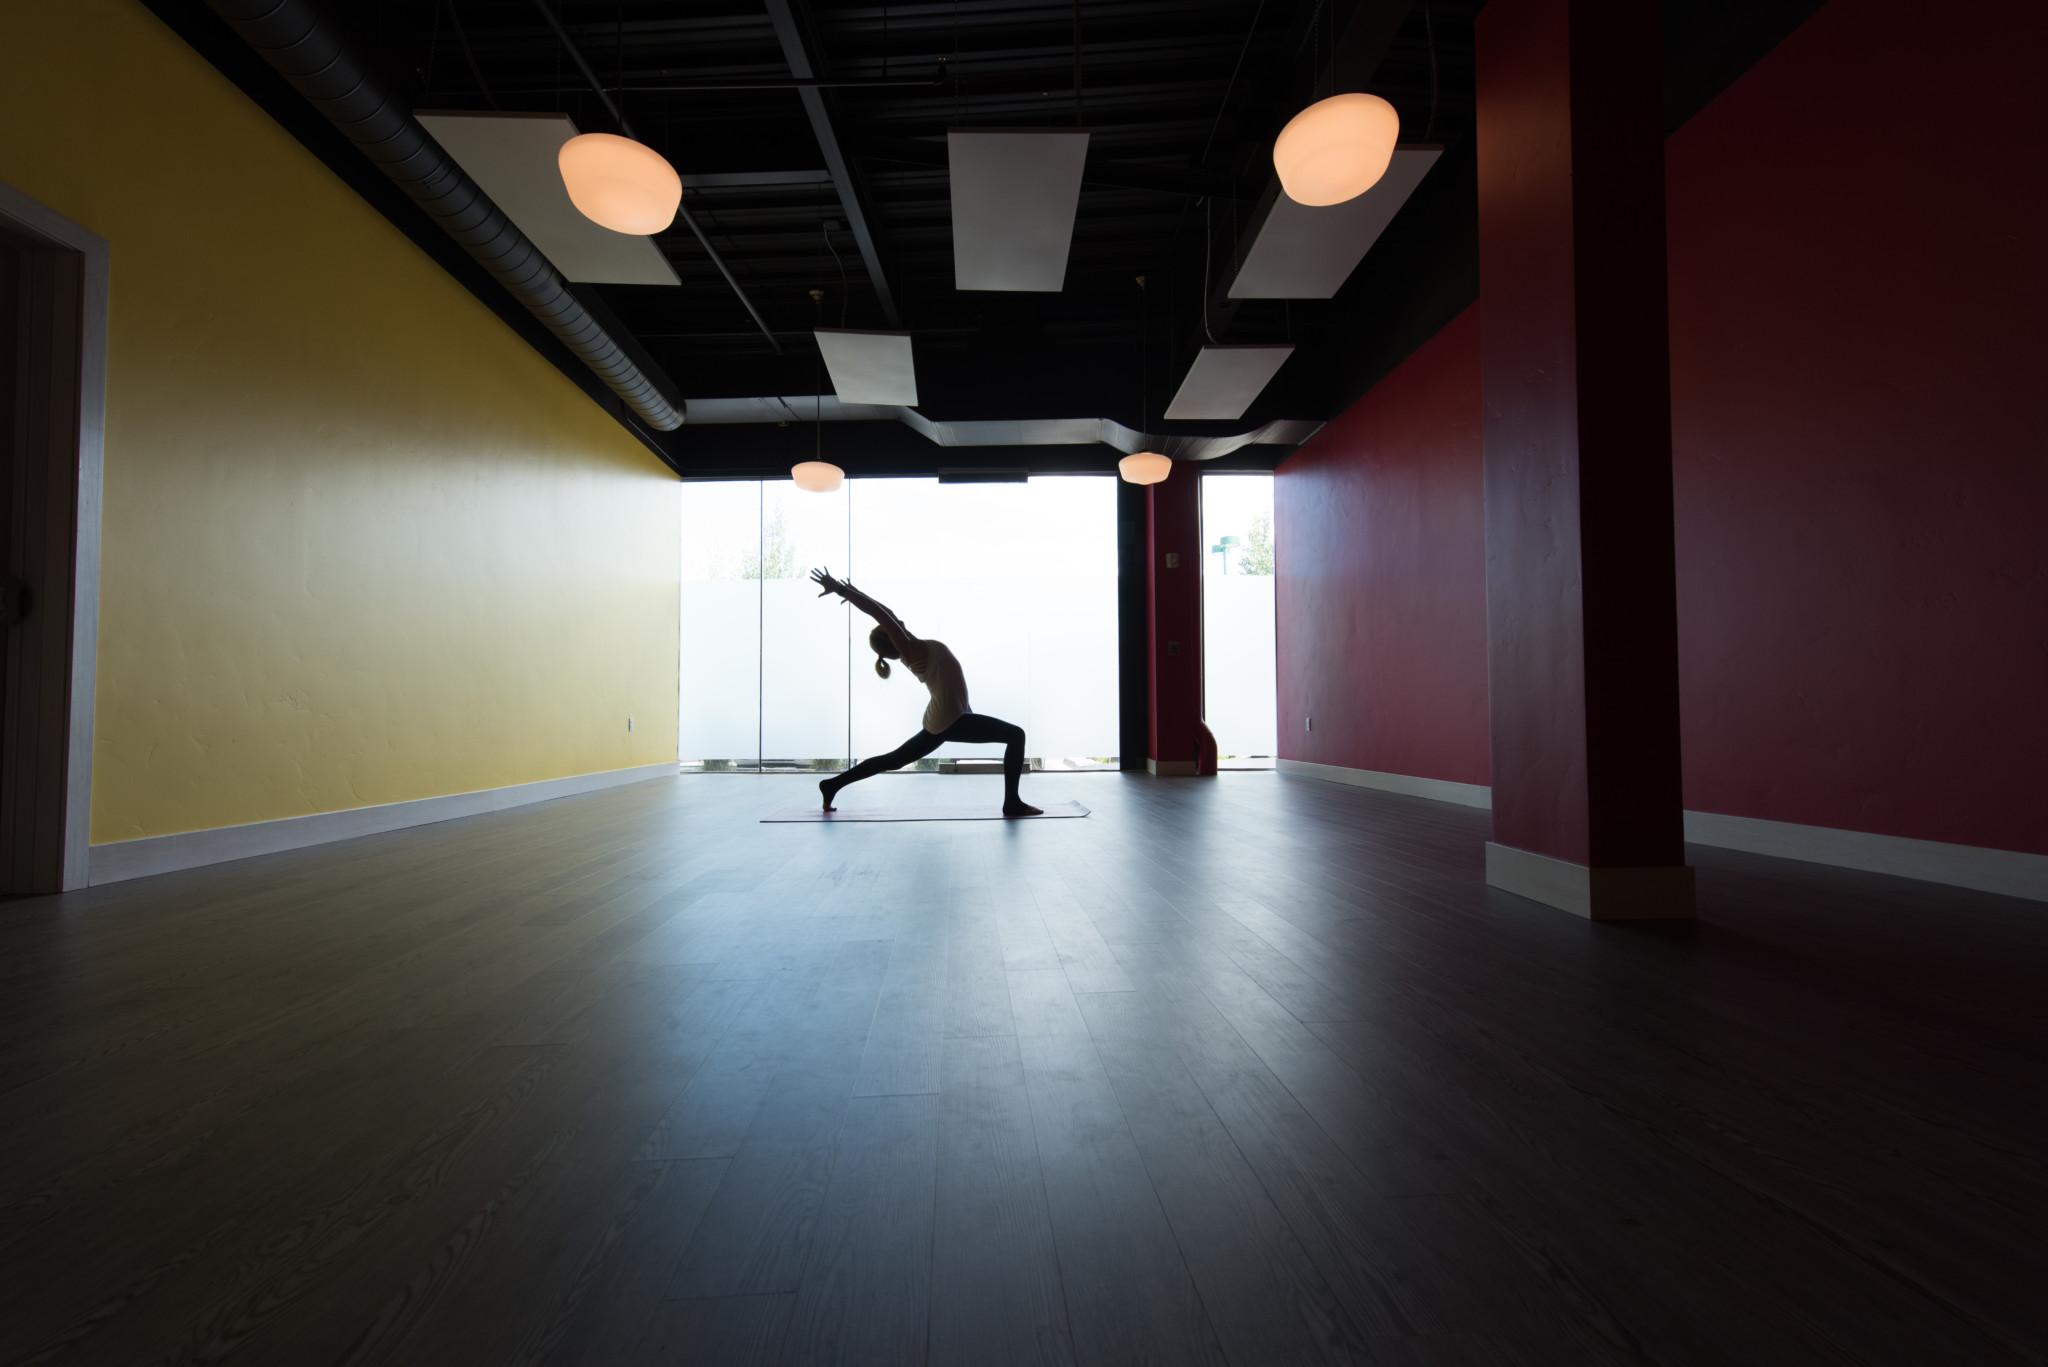 commerial Property - Revolution-power-yoga-Avon-yoga-studio-vynl-plank-flooring